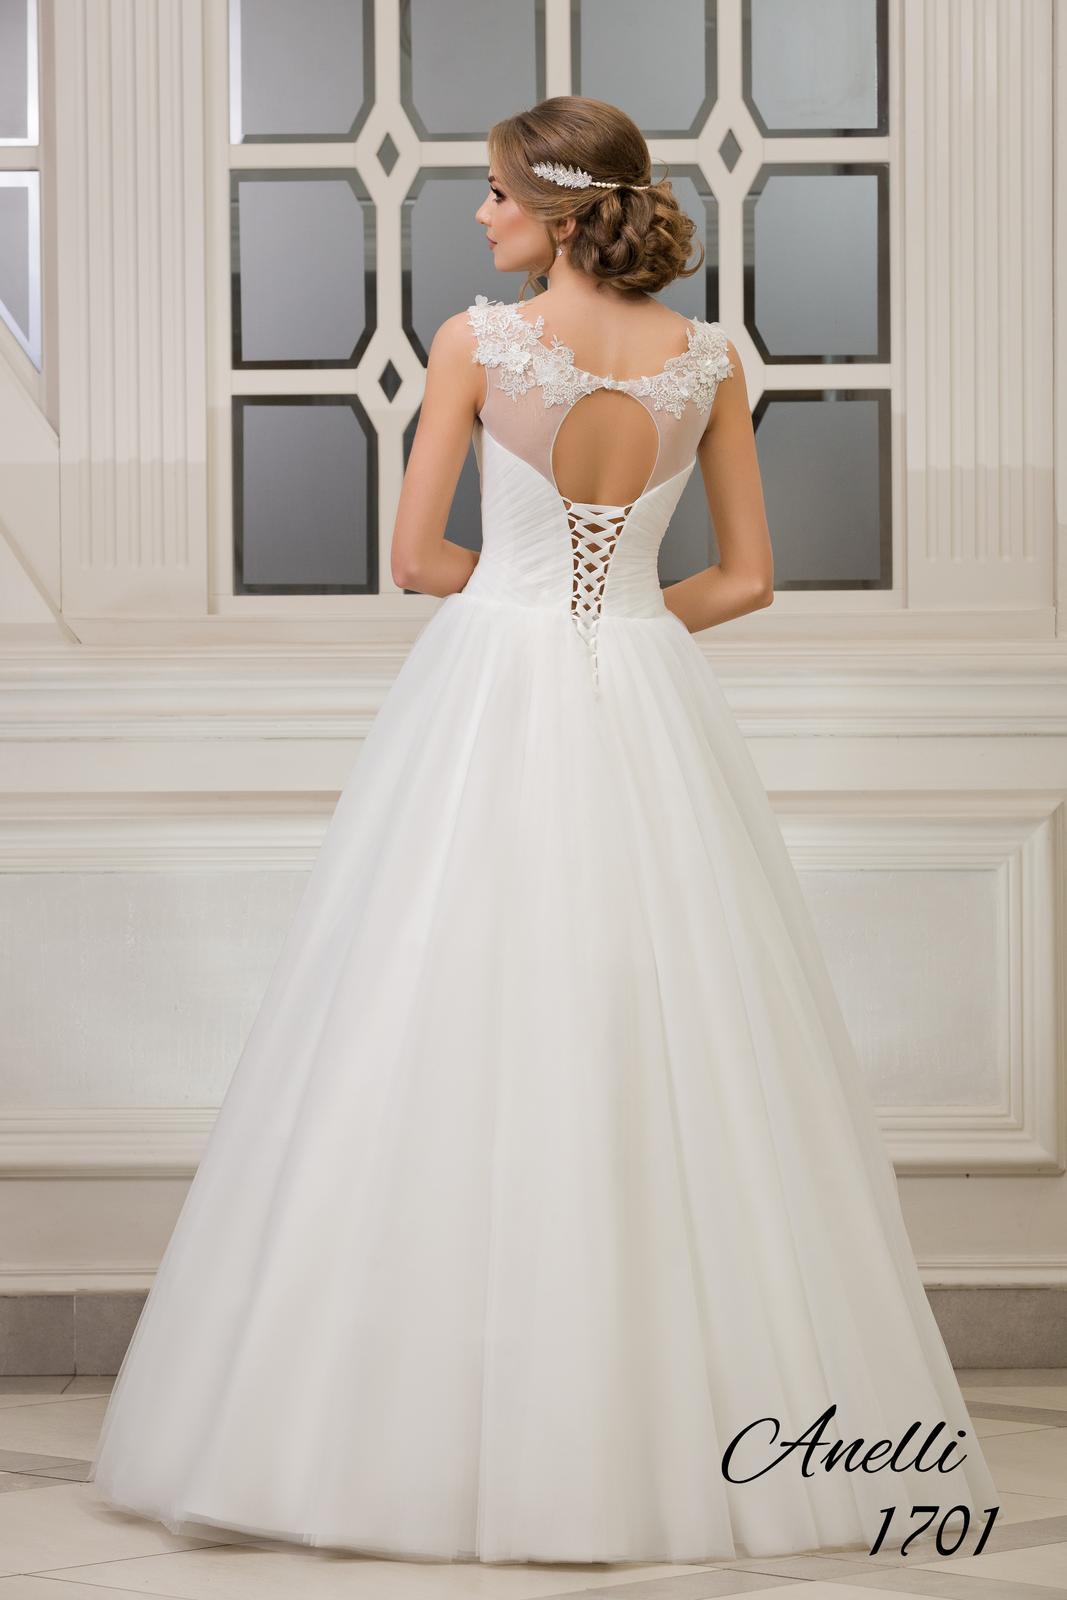 Svadobné šaty - Debut 1701 - Obrázok č. 3